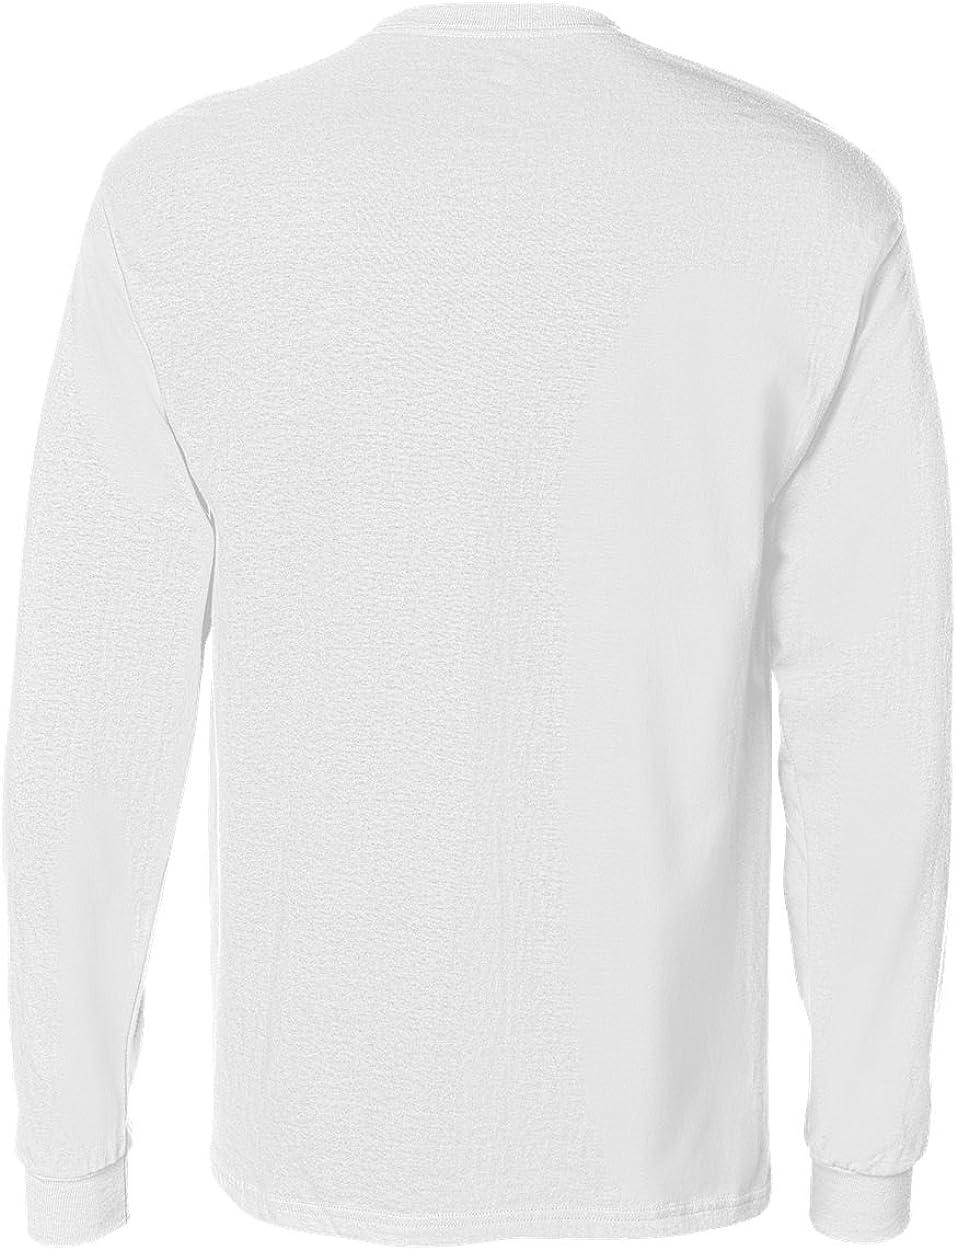 Hanes Tagless Long Sleeve T-Shirt with a Pocket